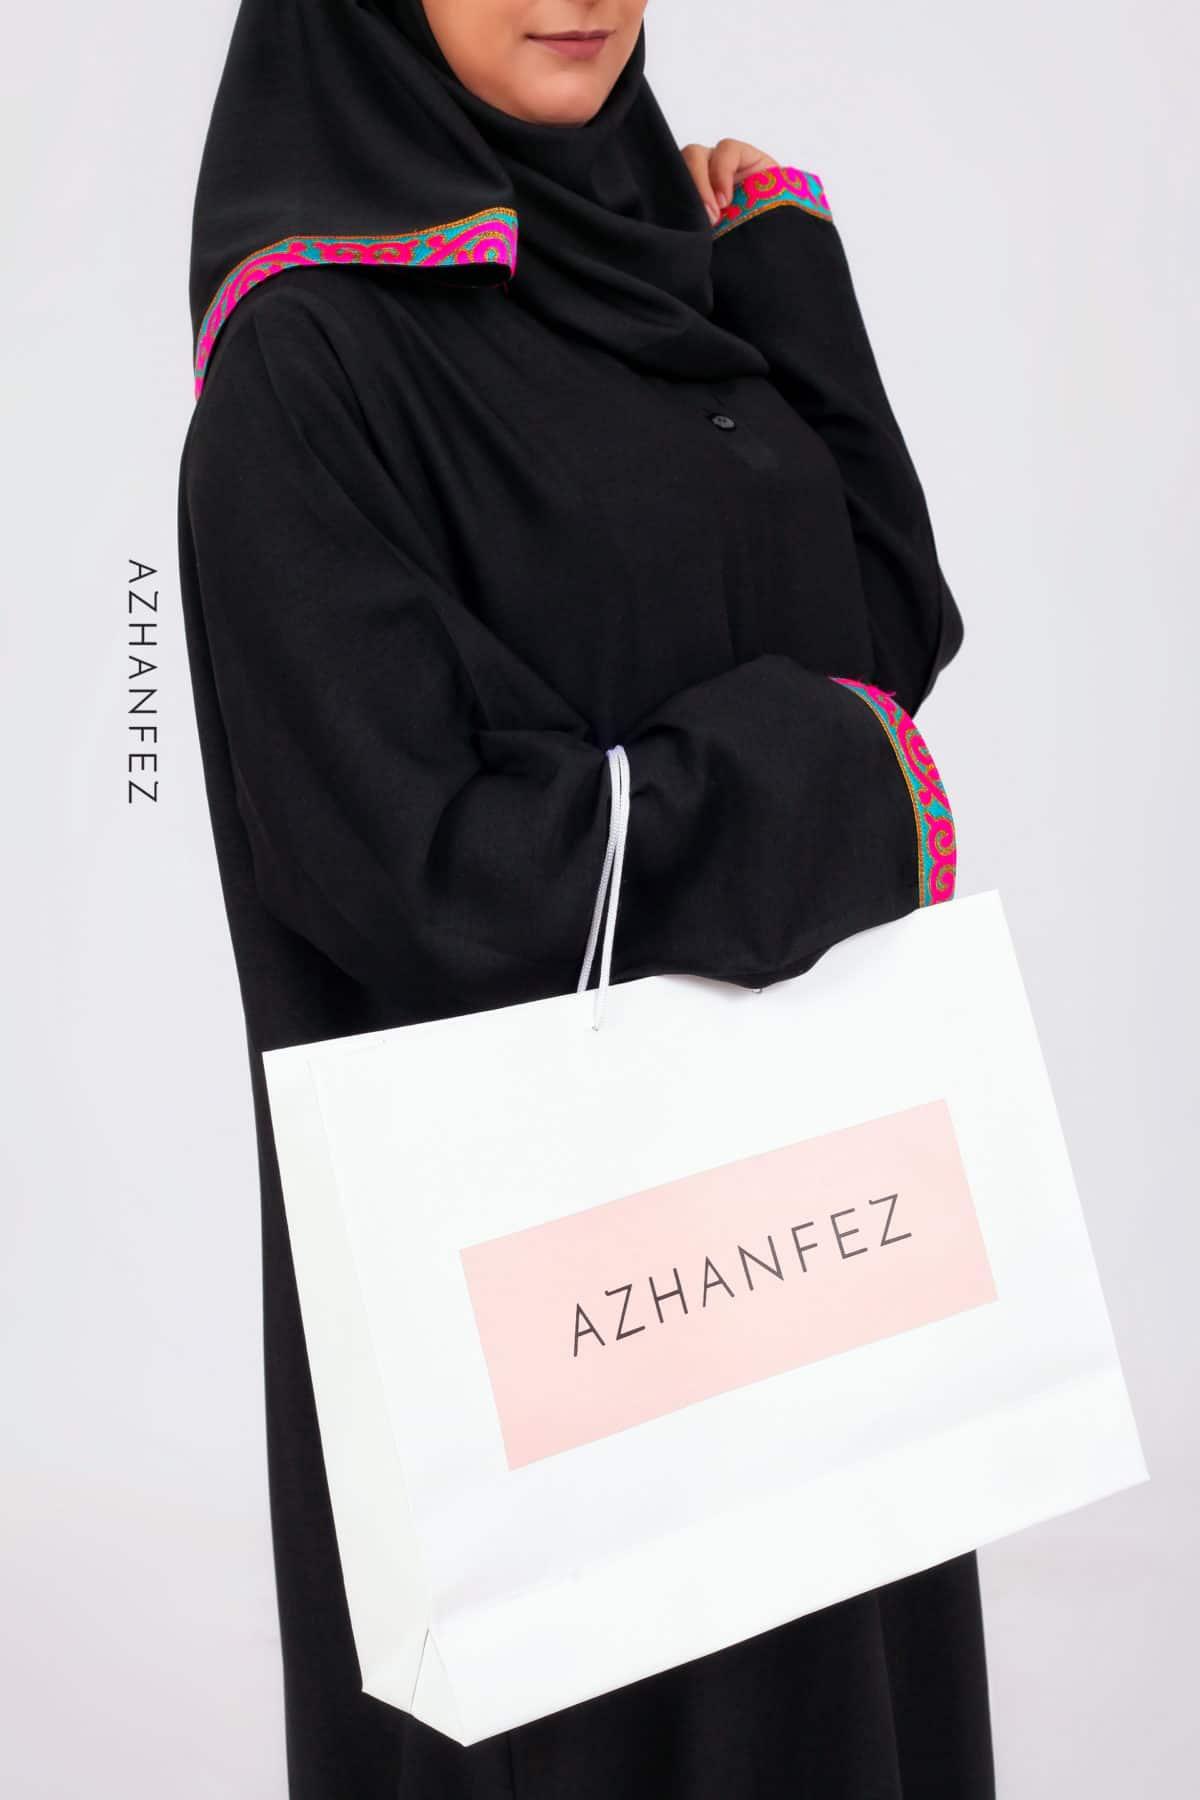 abaya azhanfez babsbaa fantaisie 2